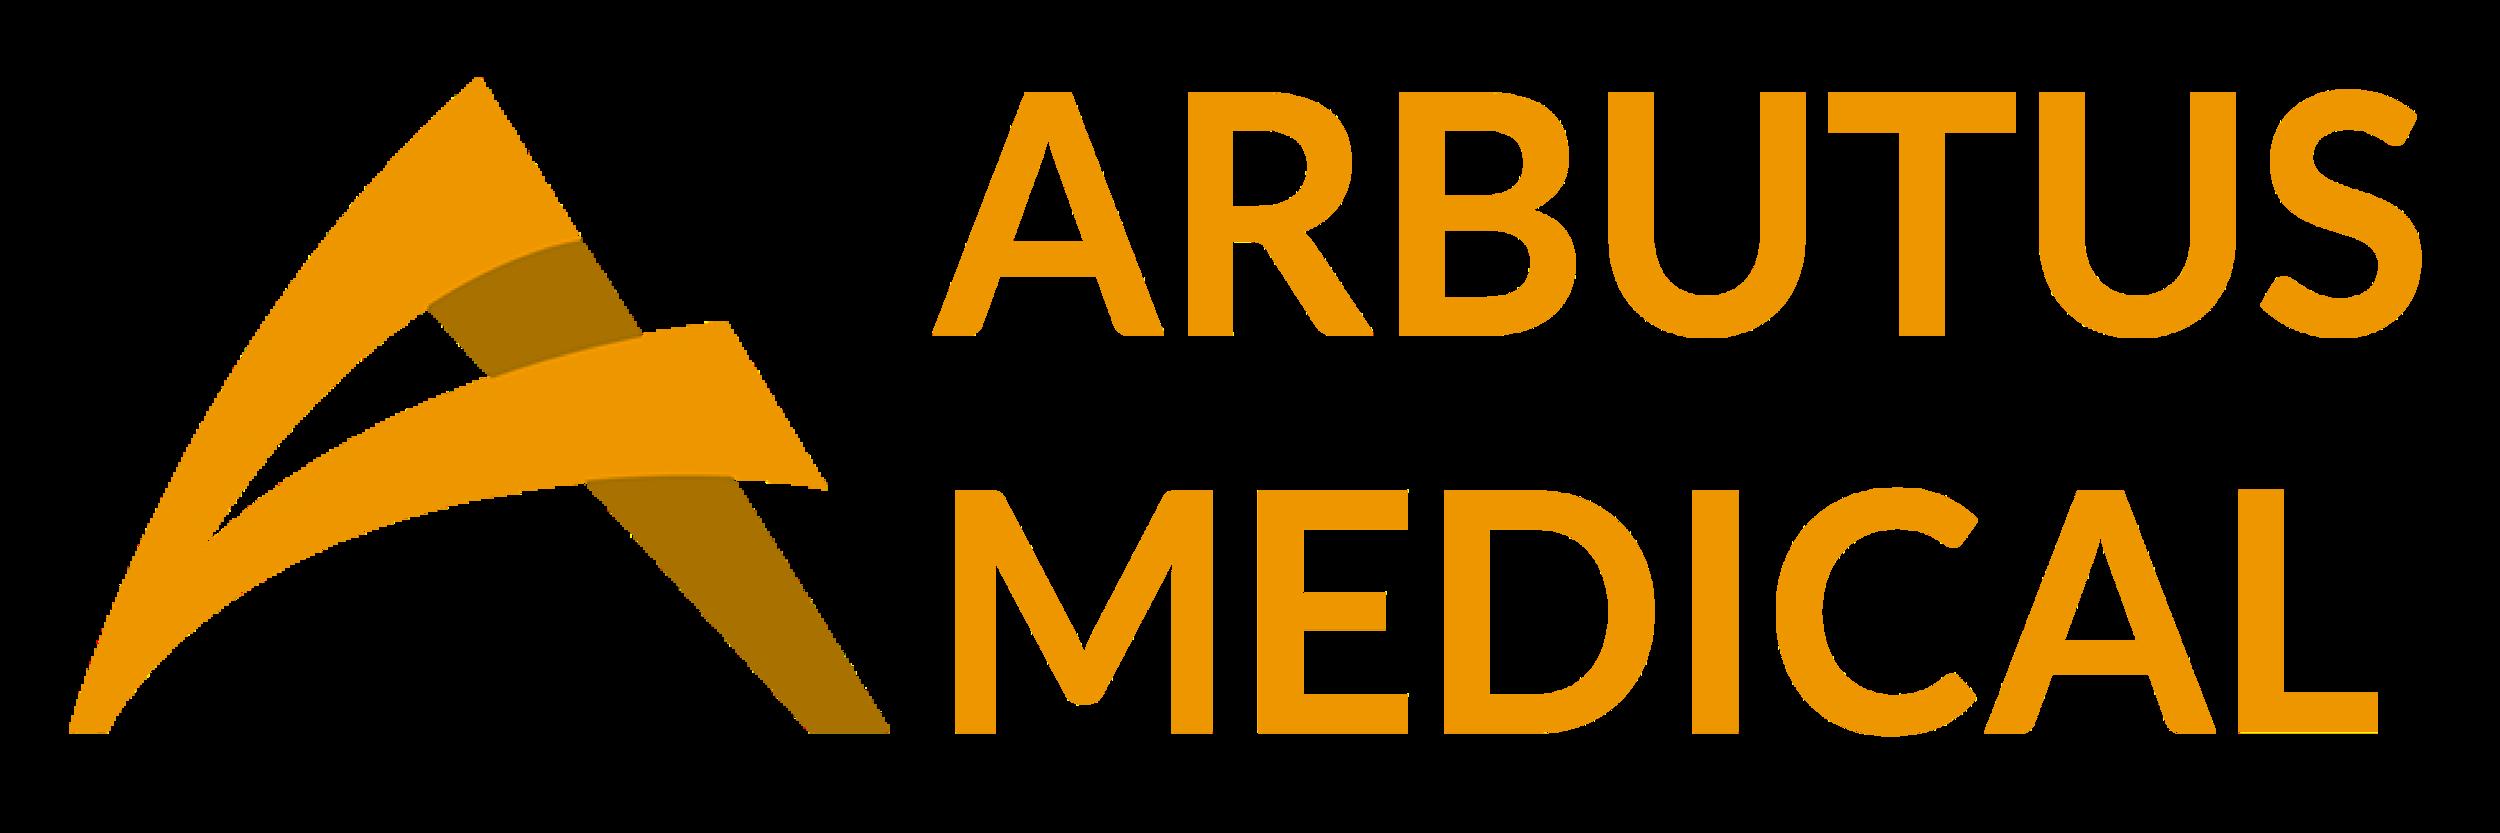 arbutus.png